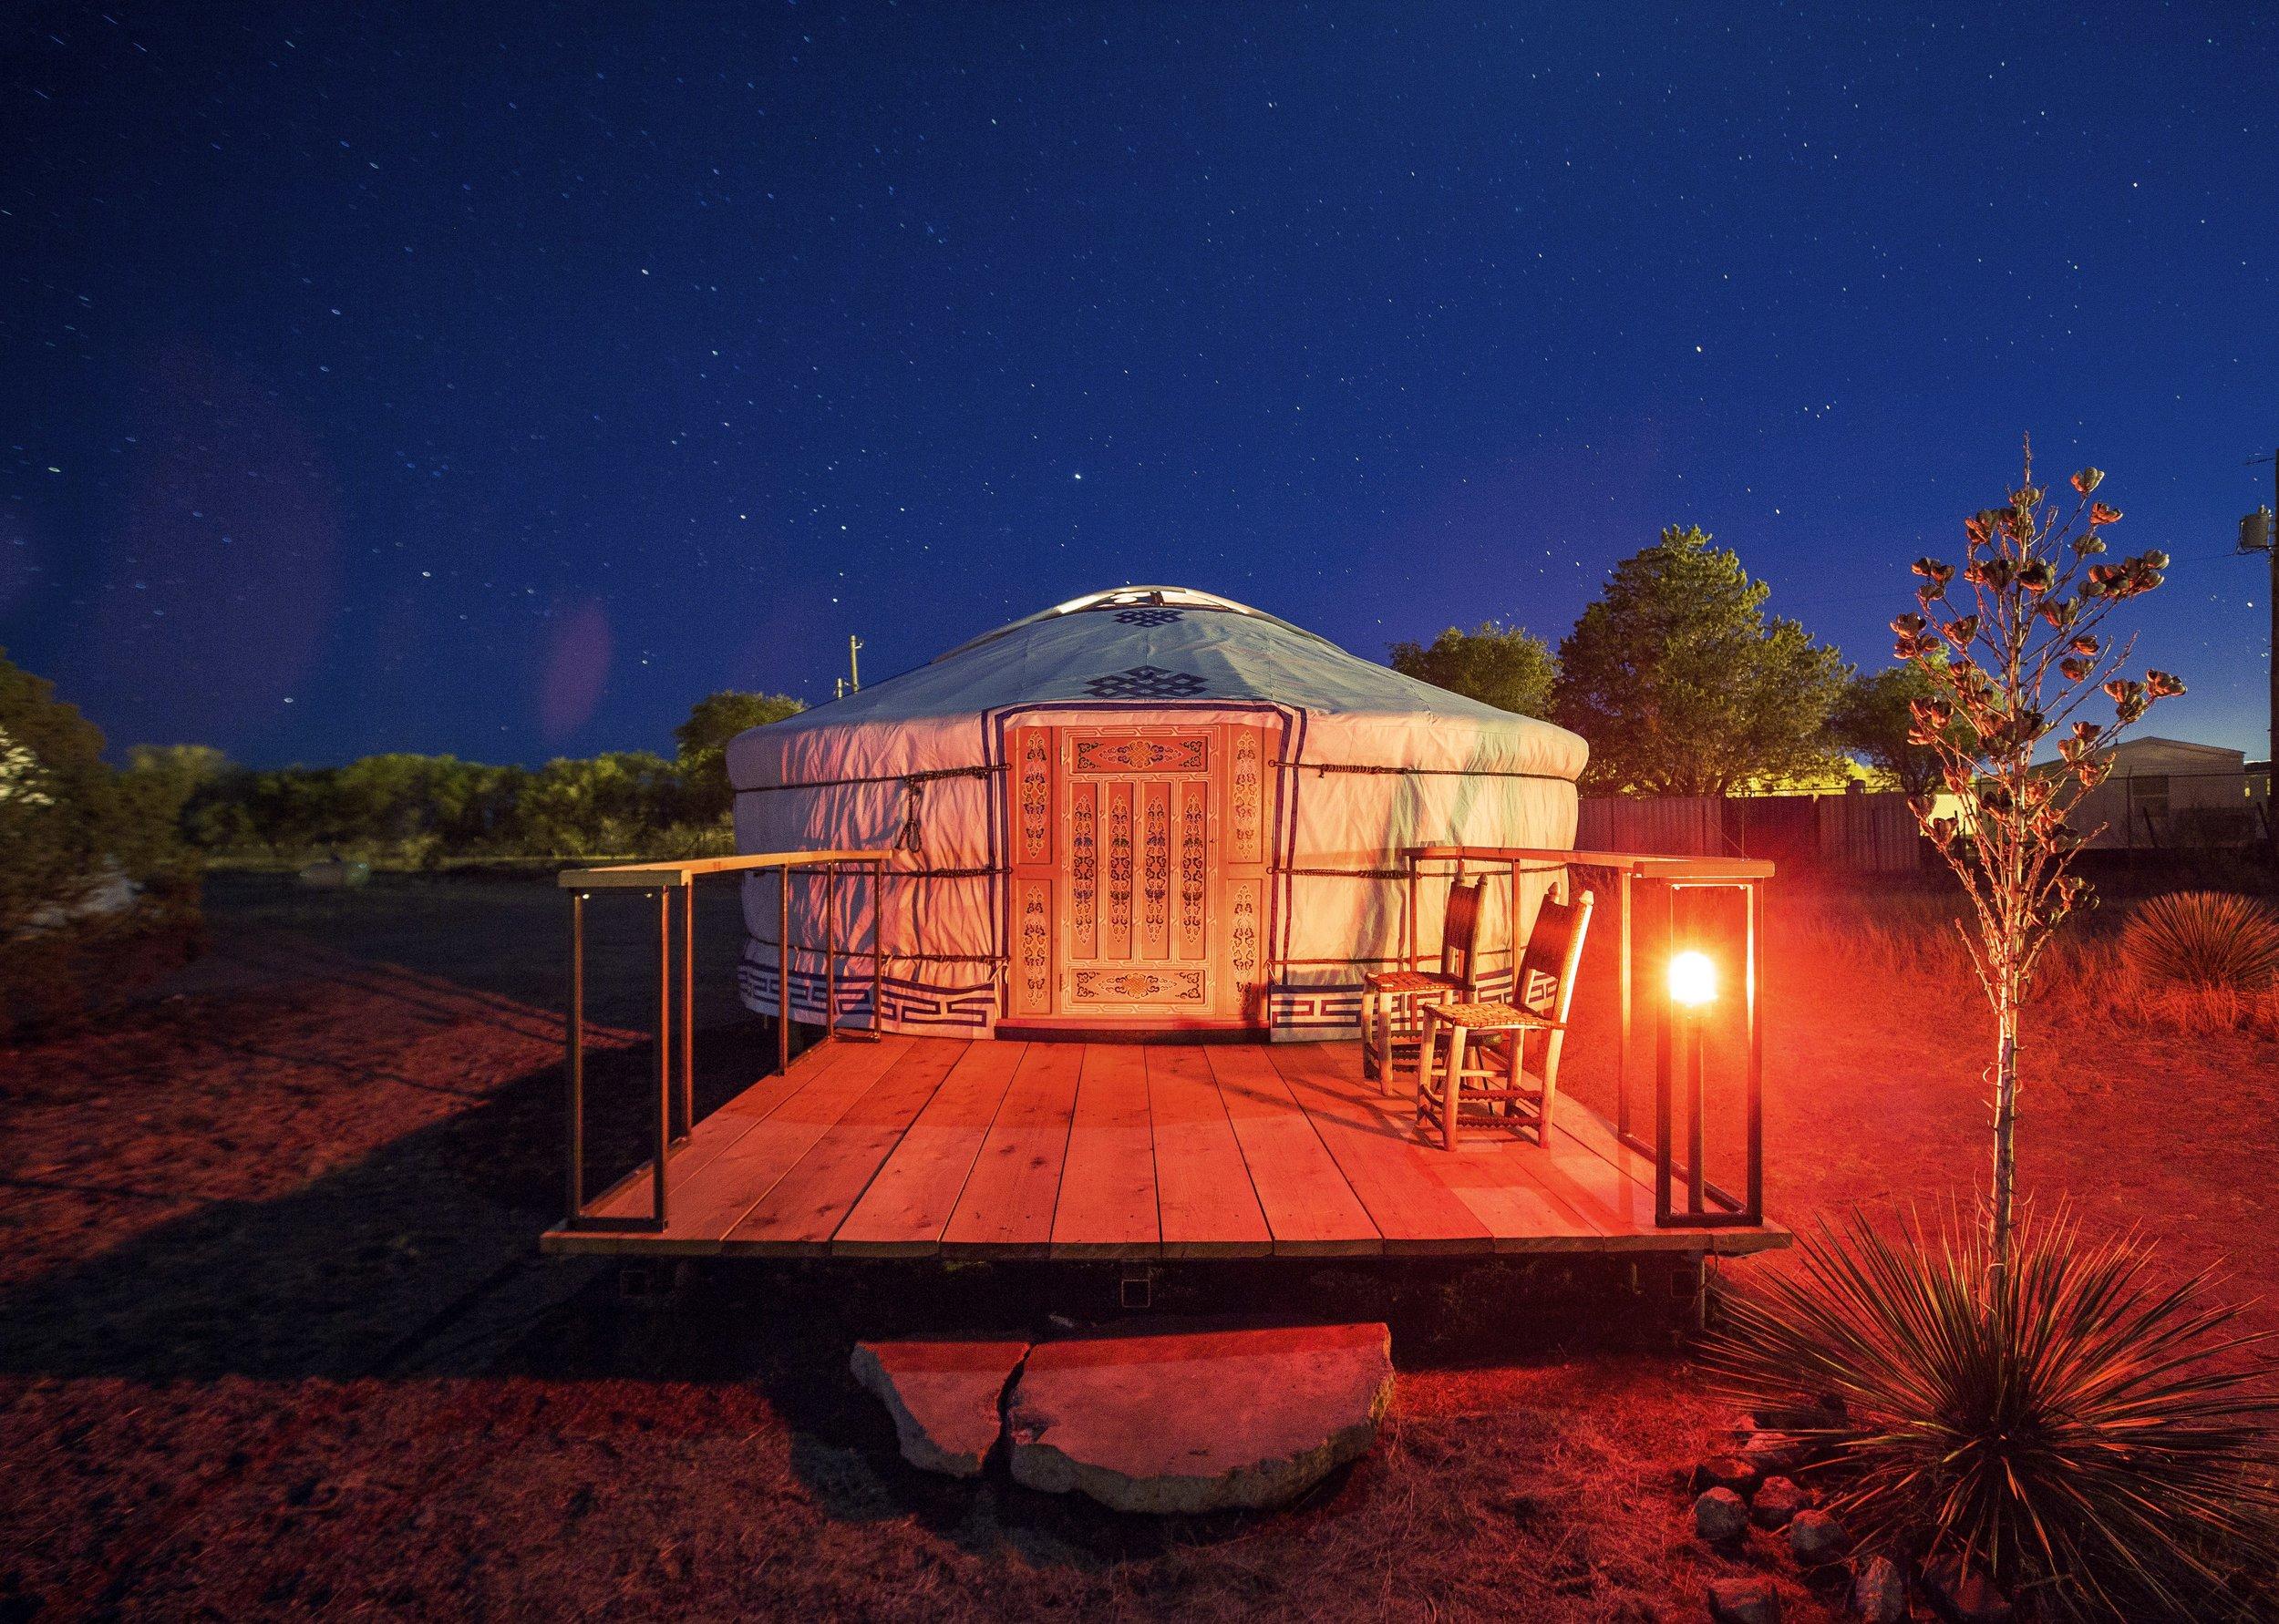 El Comisco - Yurt Exterior - Nick Simonite.jpg